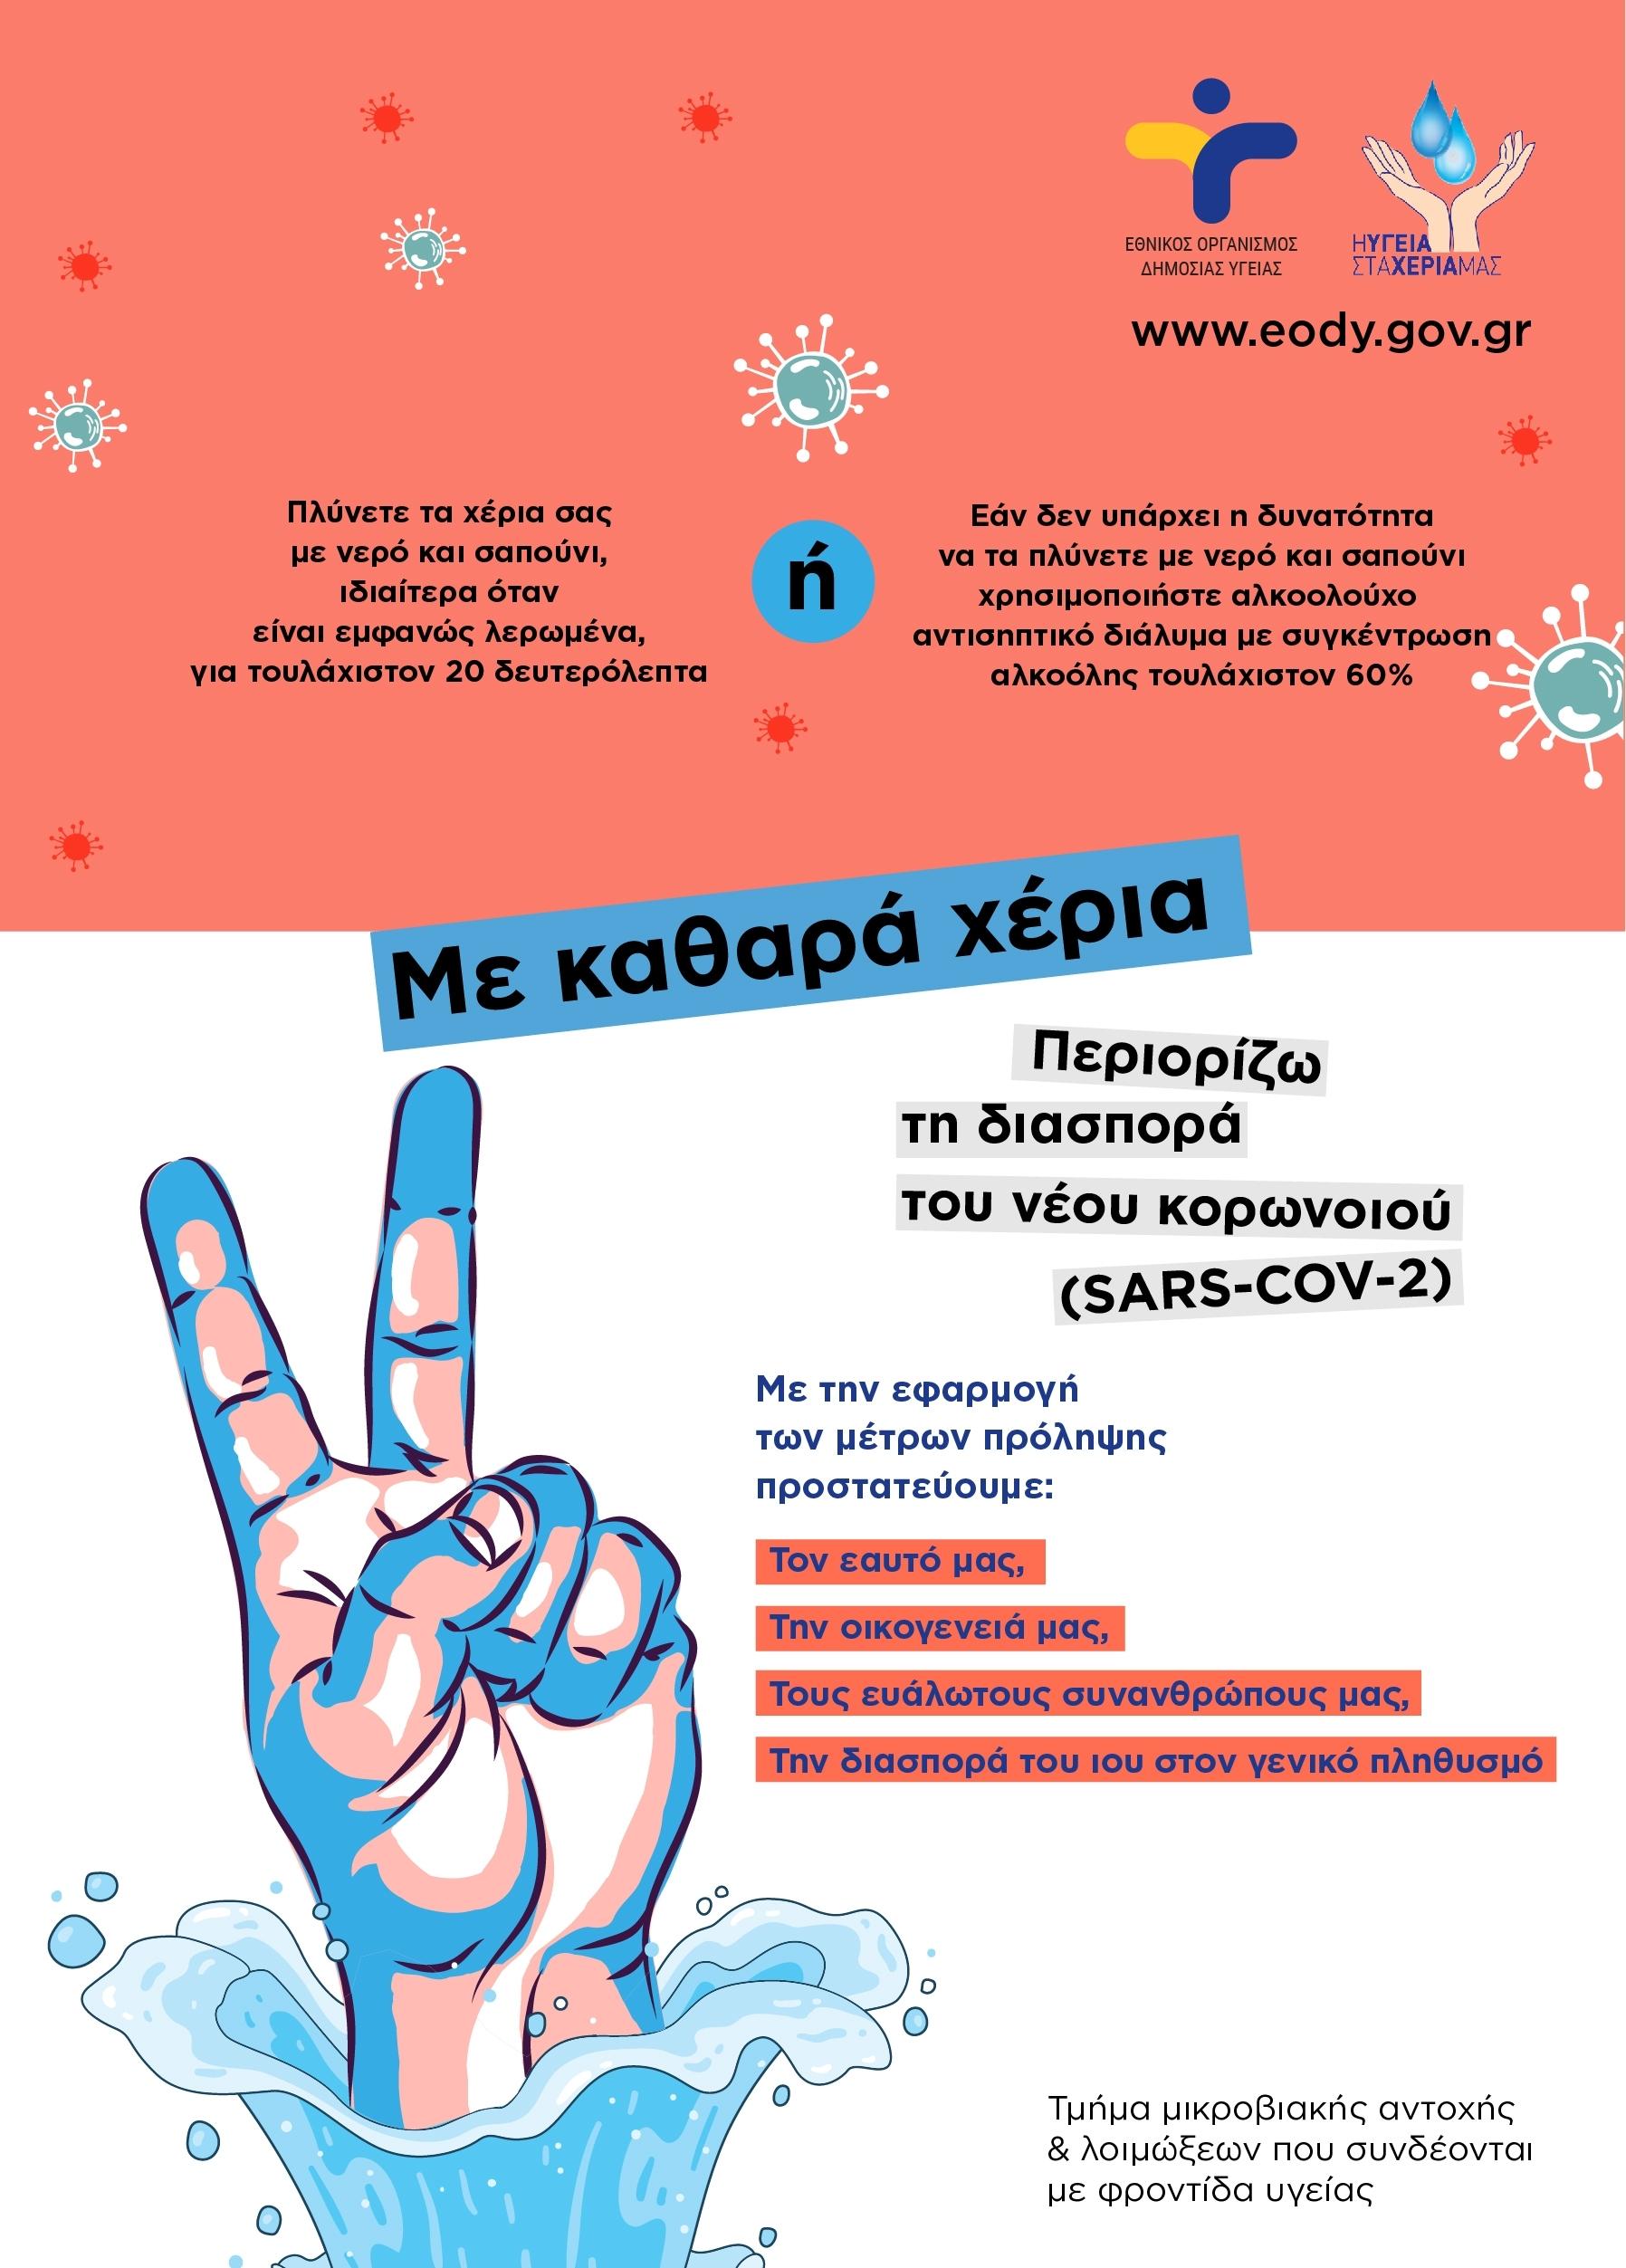 ygieini_herion_afisa_1_1.jpg